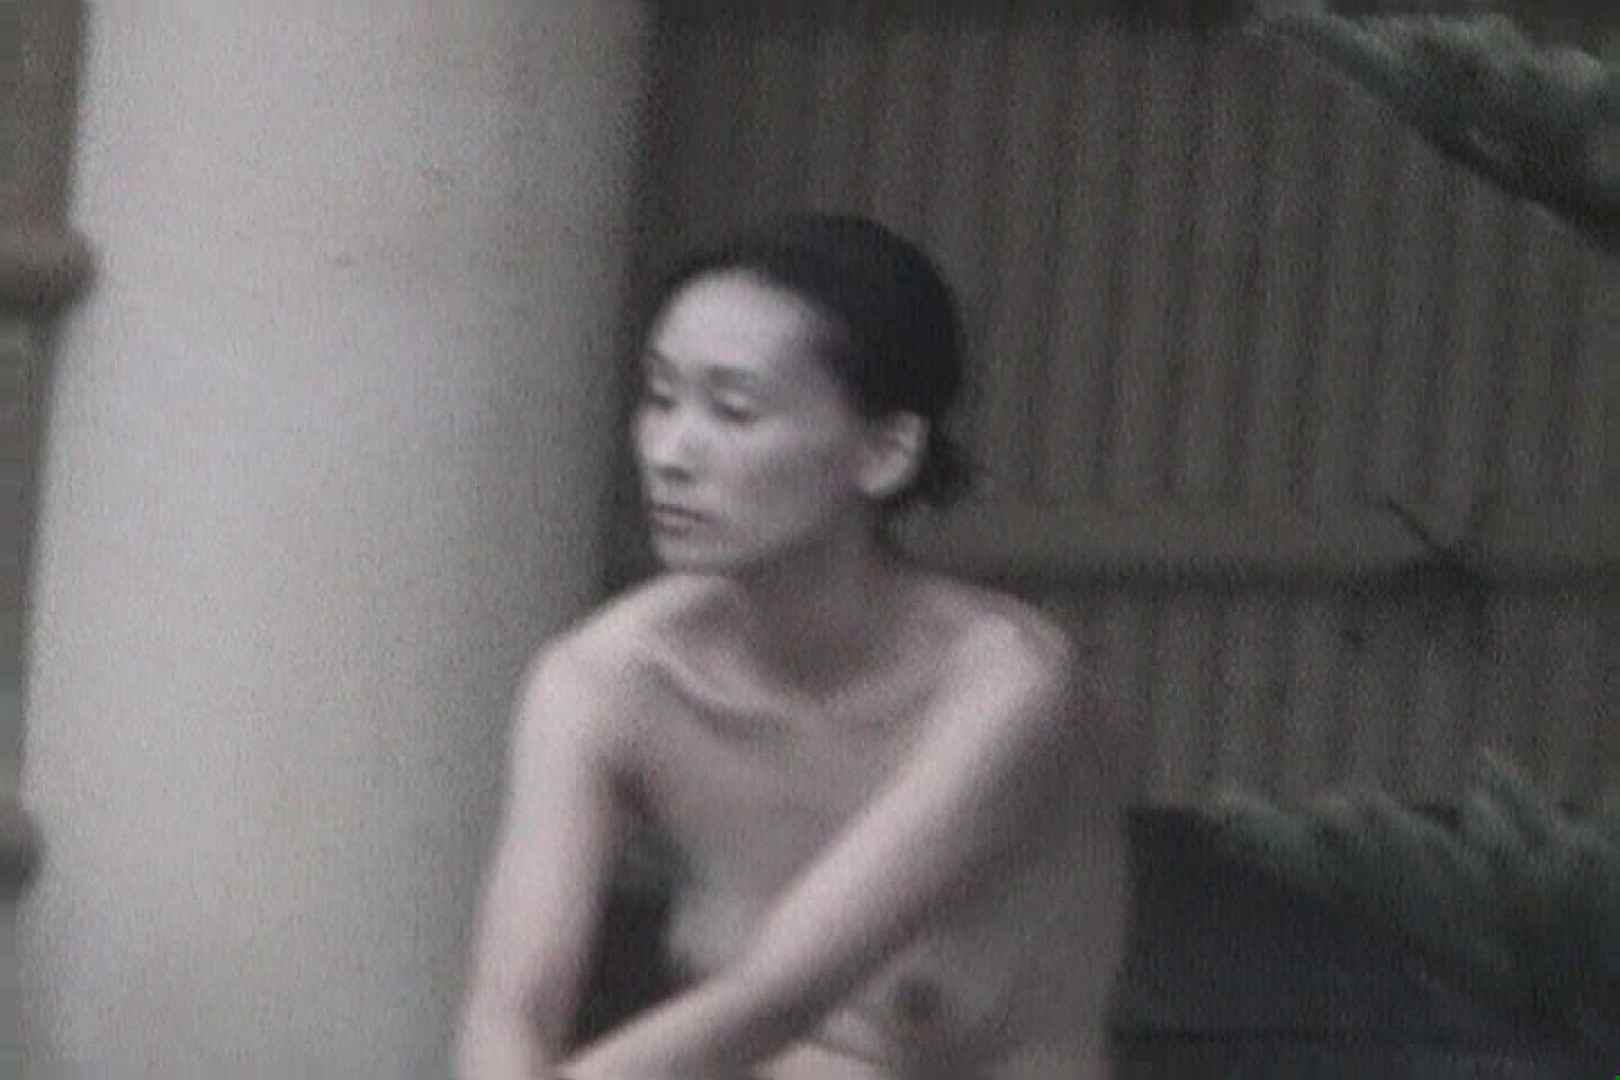 Aquaな露天風呂Vol.557 綺麗なOLたち  78枚 57